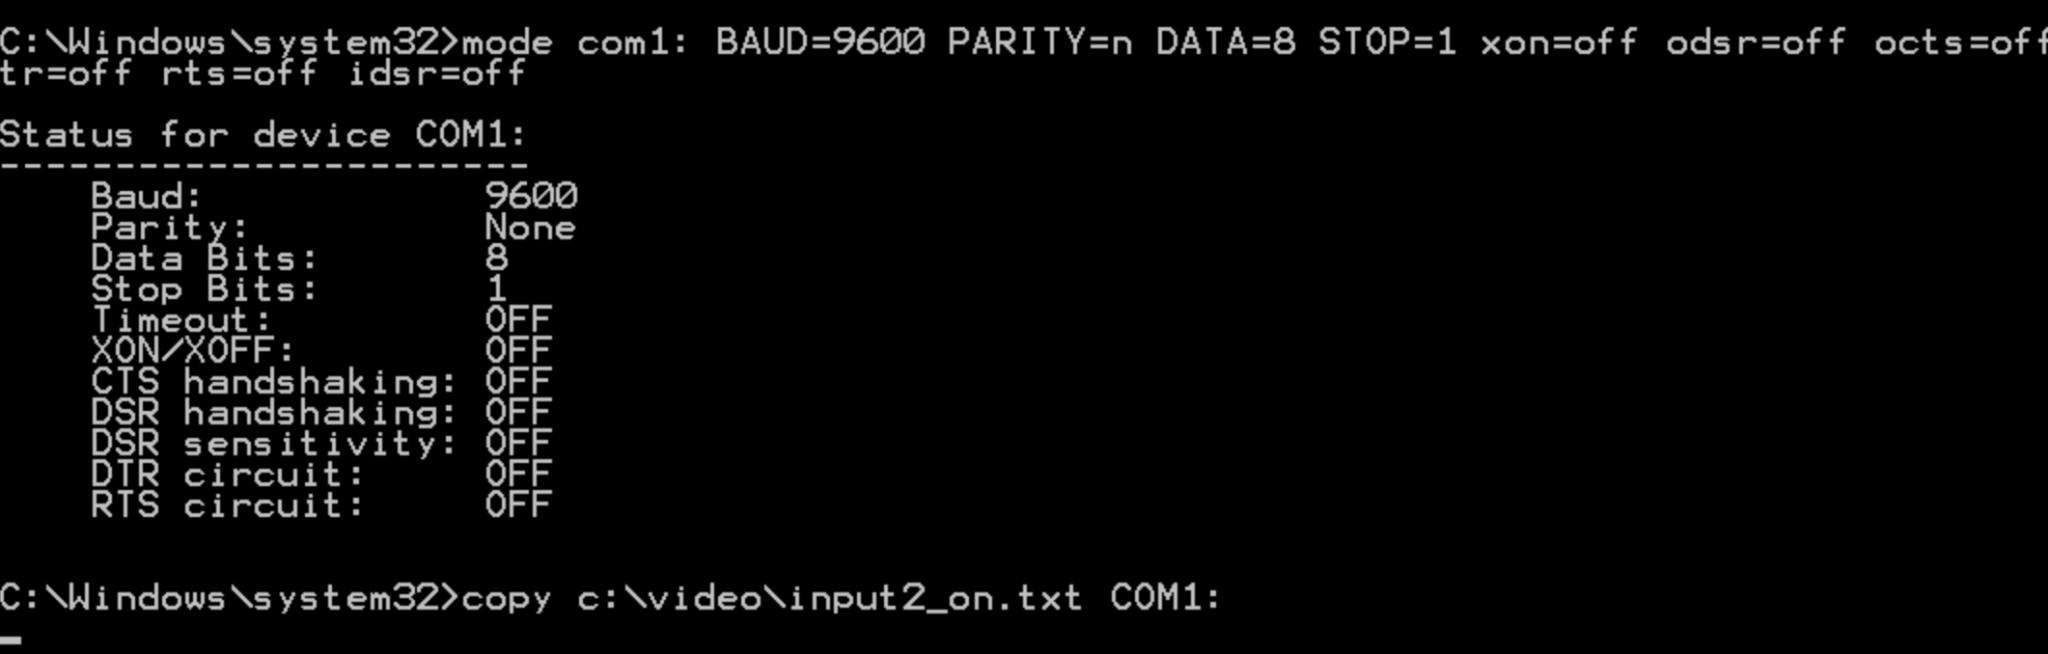 Nombre:  Screen Shot 2019-12-26 at 09.42.08.jpg Visitas: 84 Tamaño: 73.9 KB